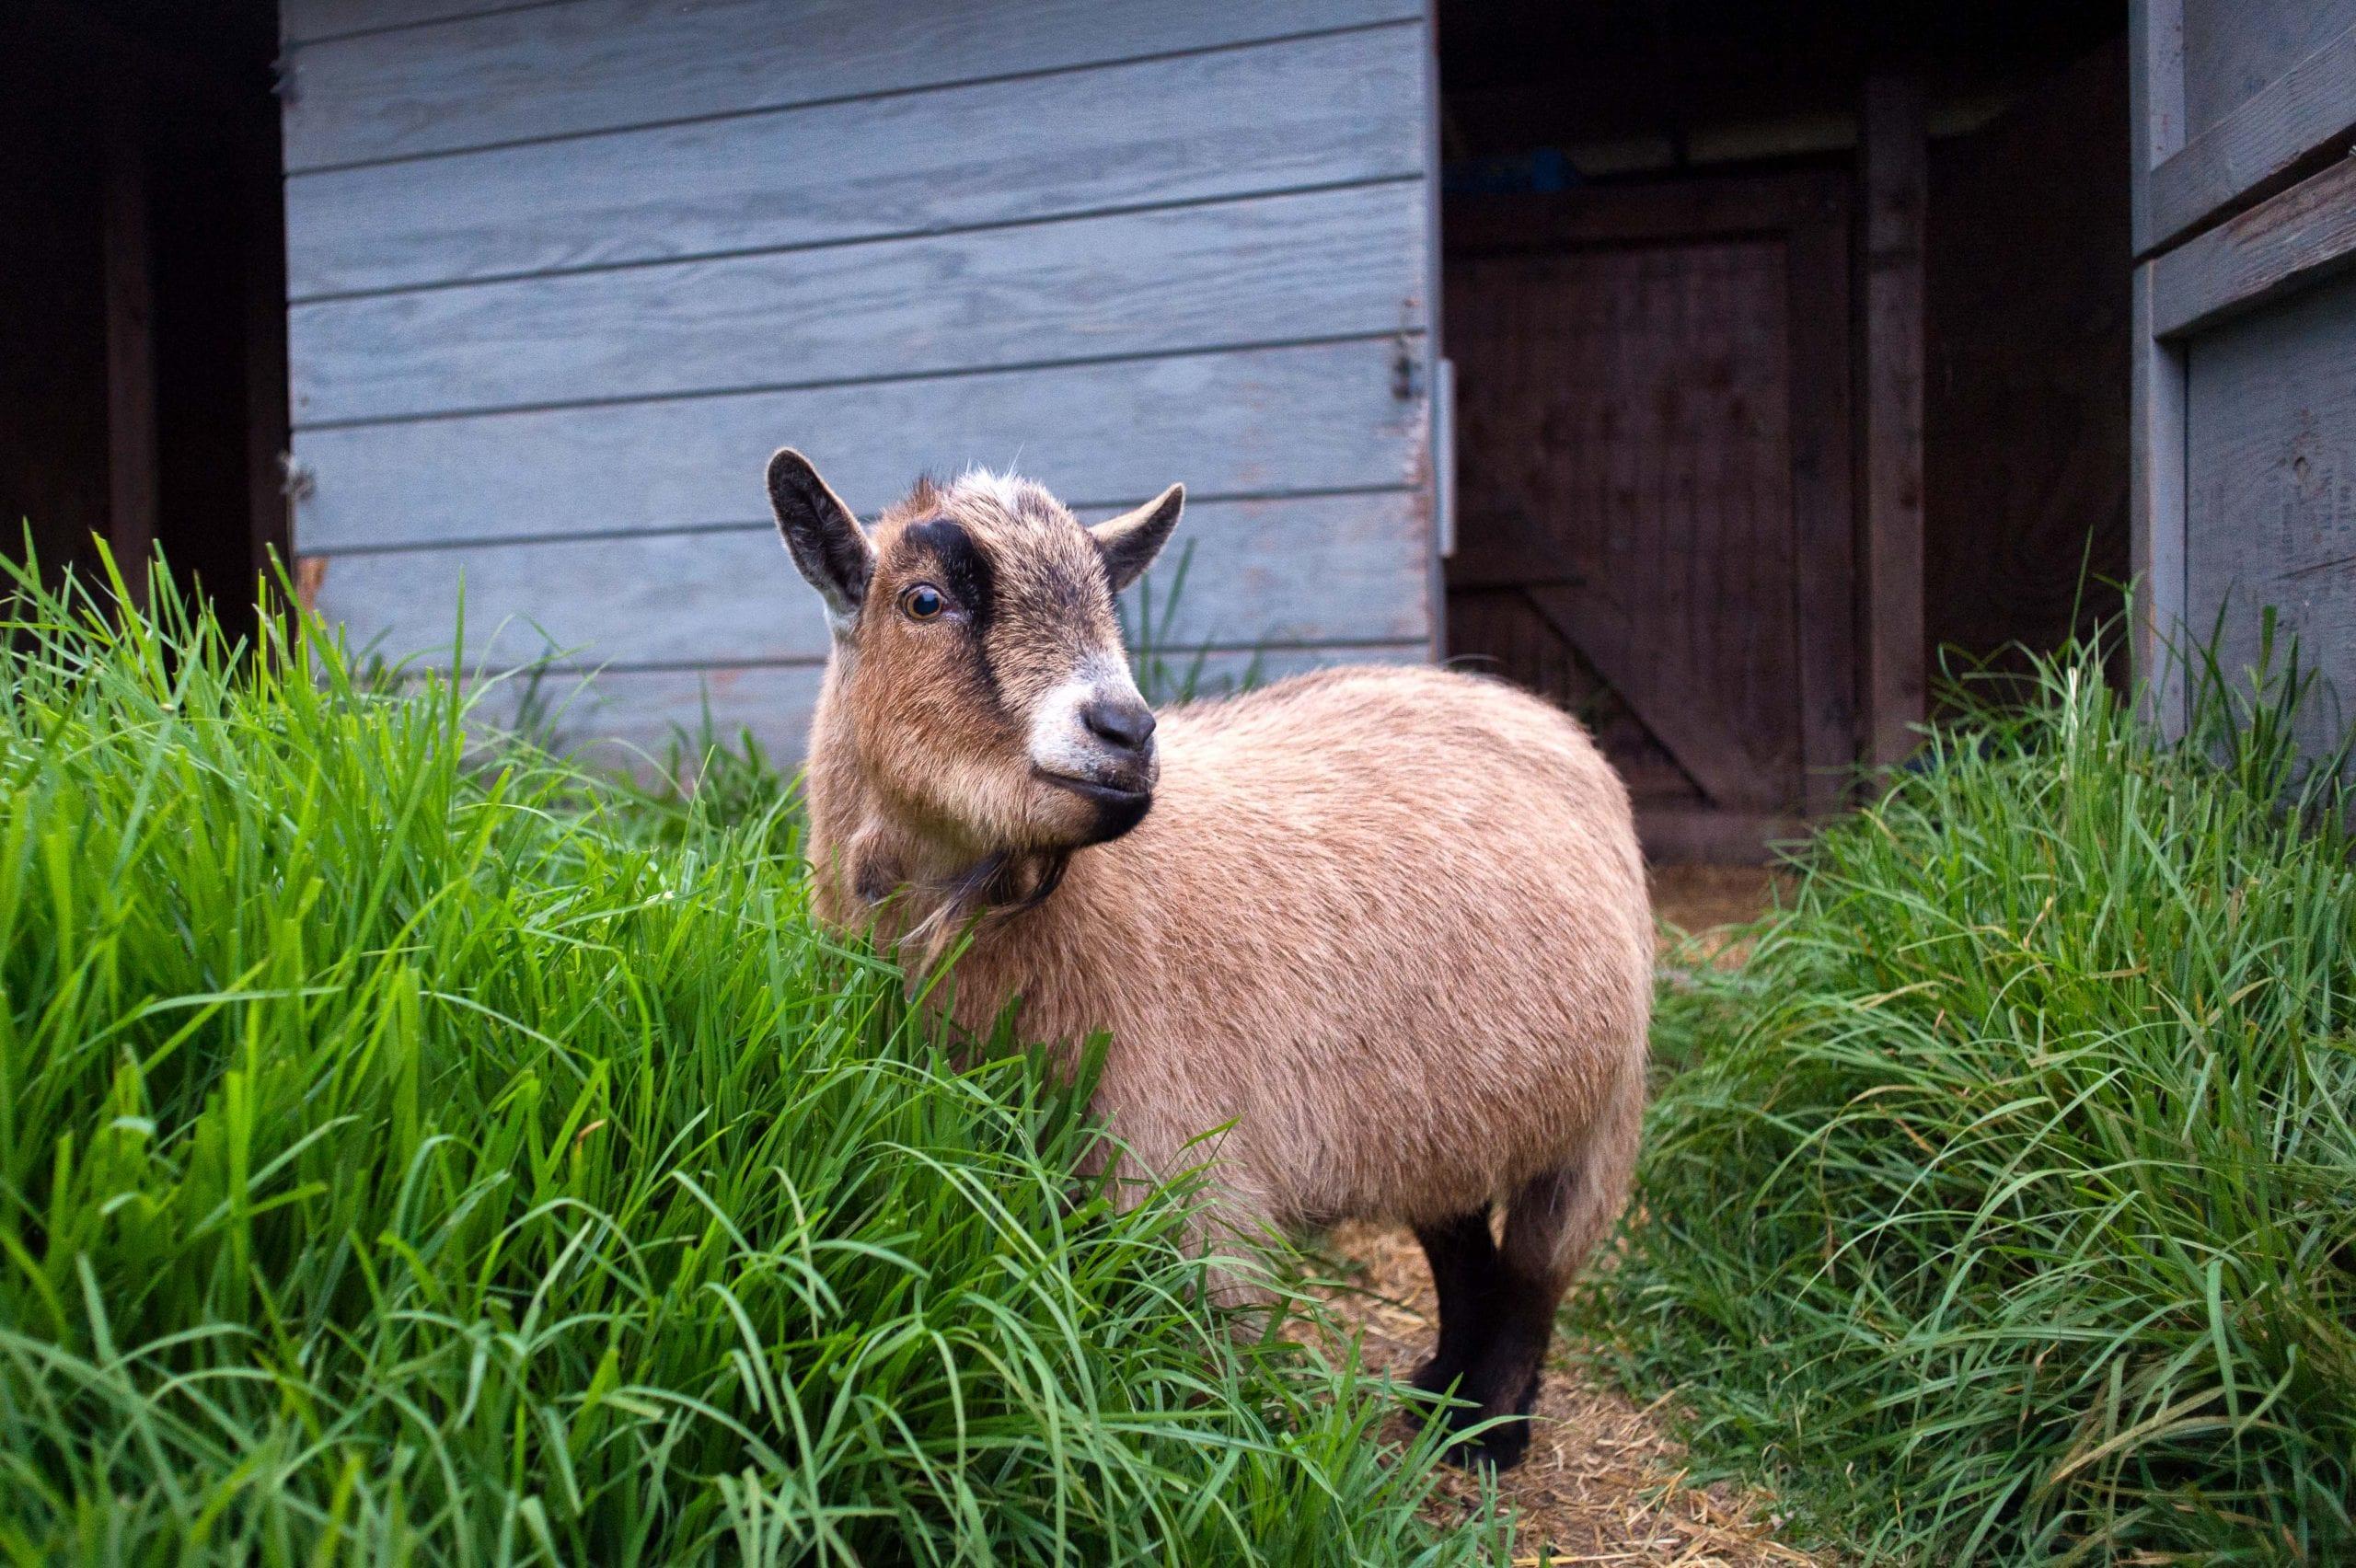 Billy goat, pygmy goat. Same idea. Cubs must lose. Photo by Steve Hymon.